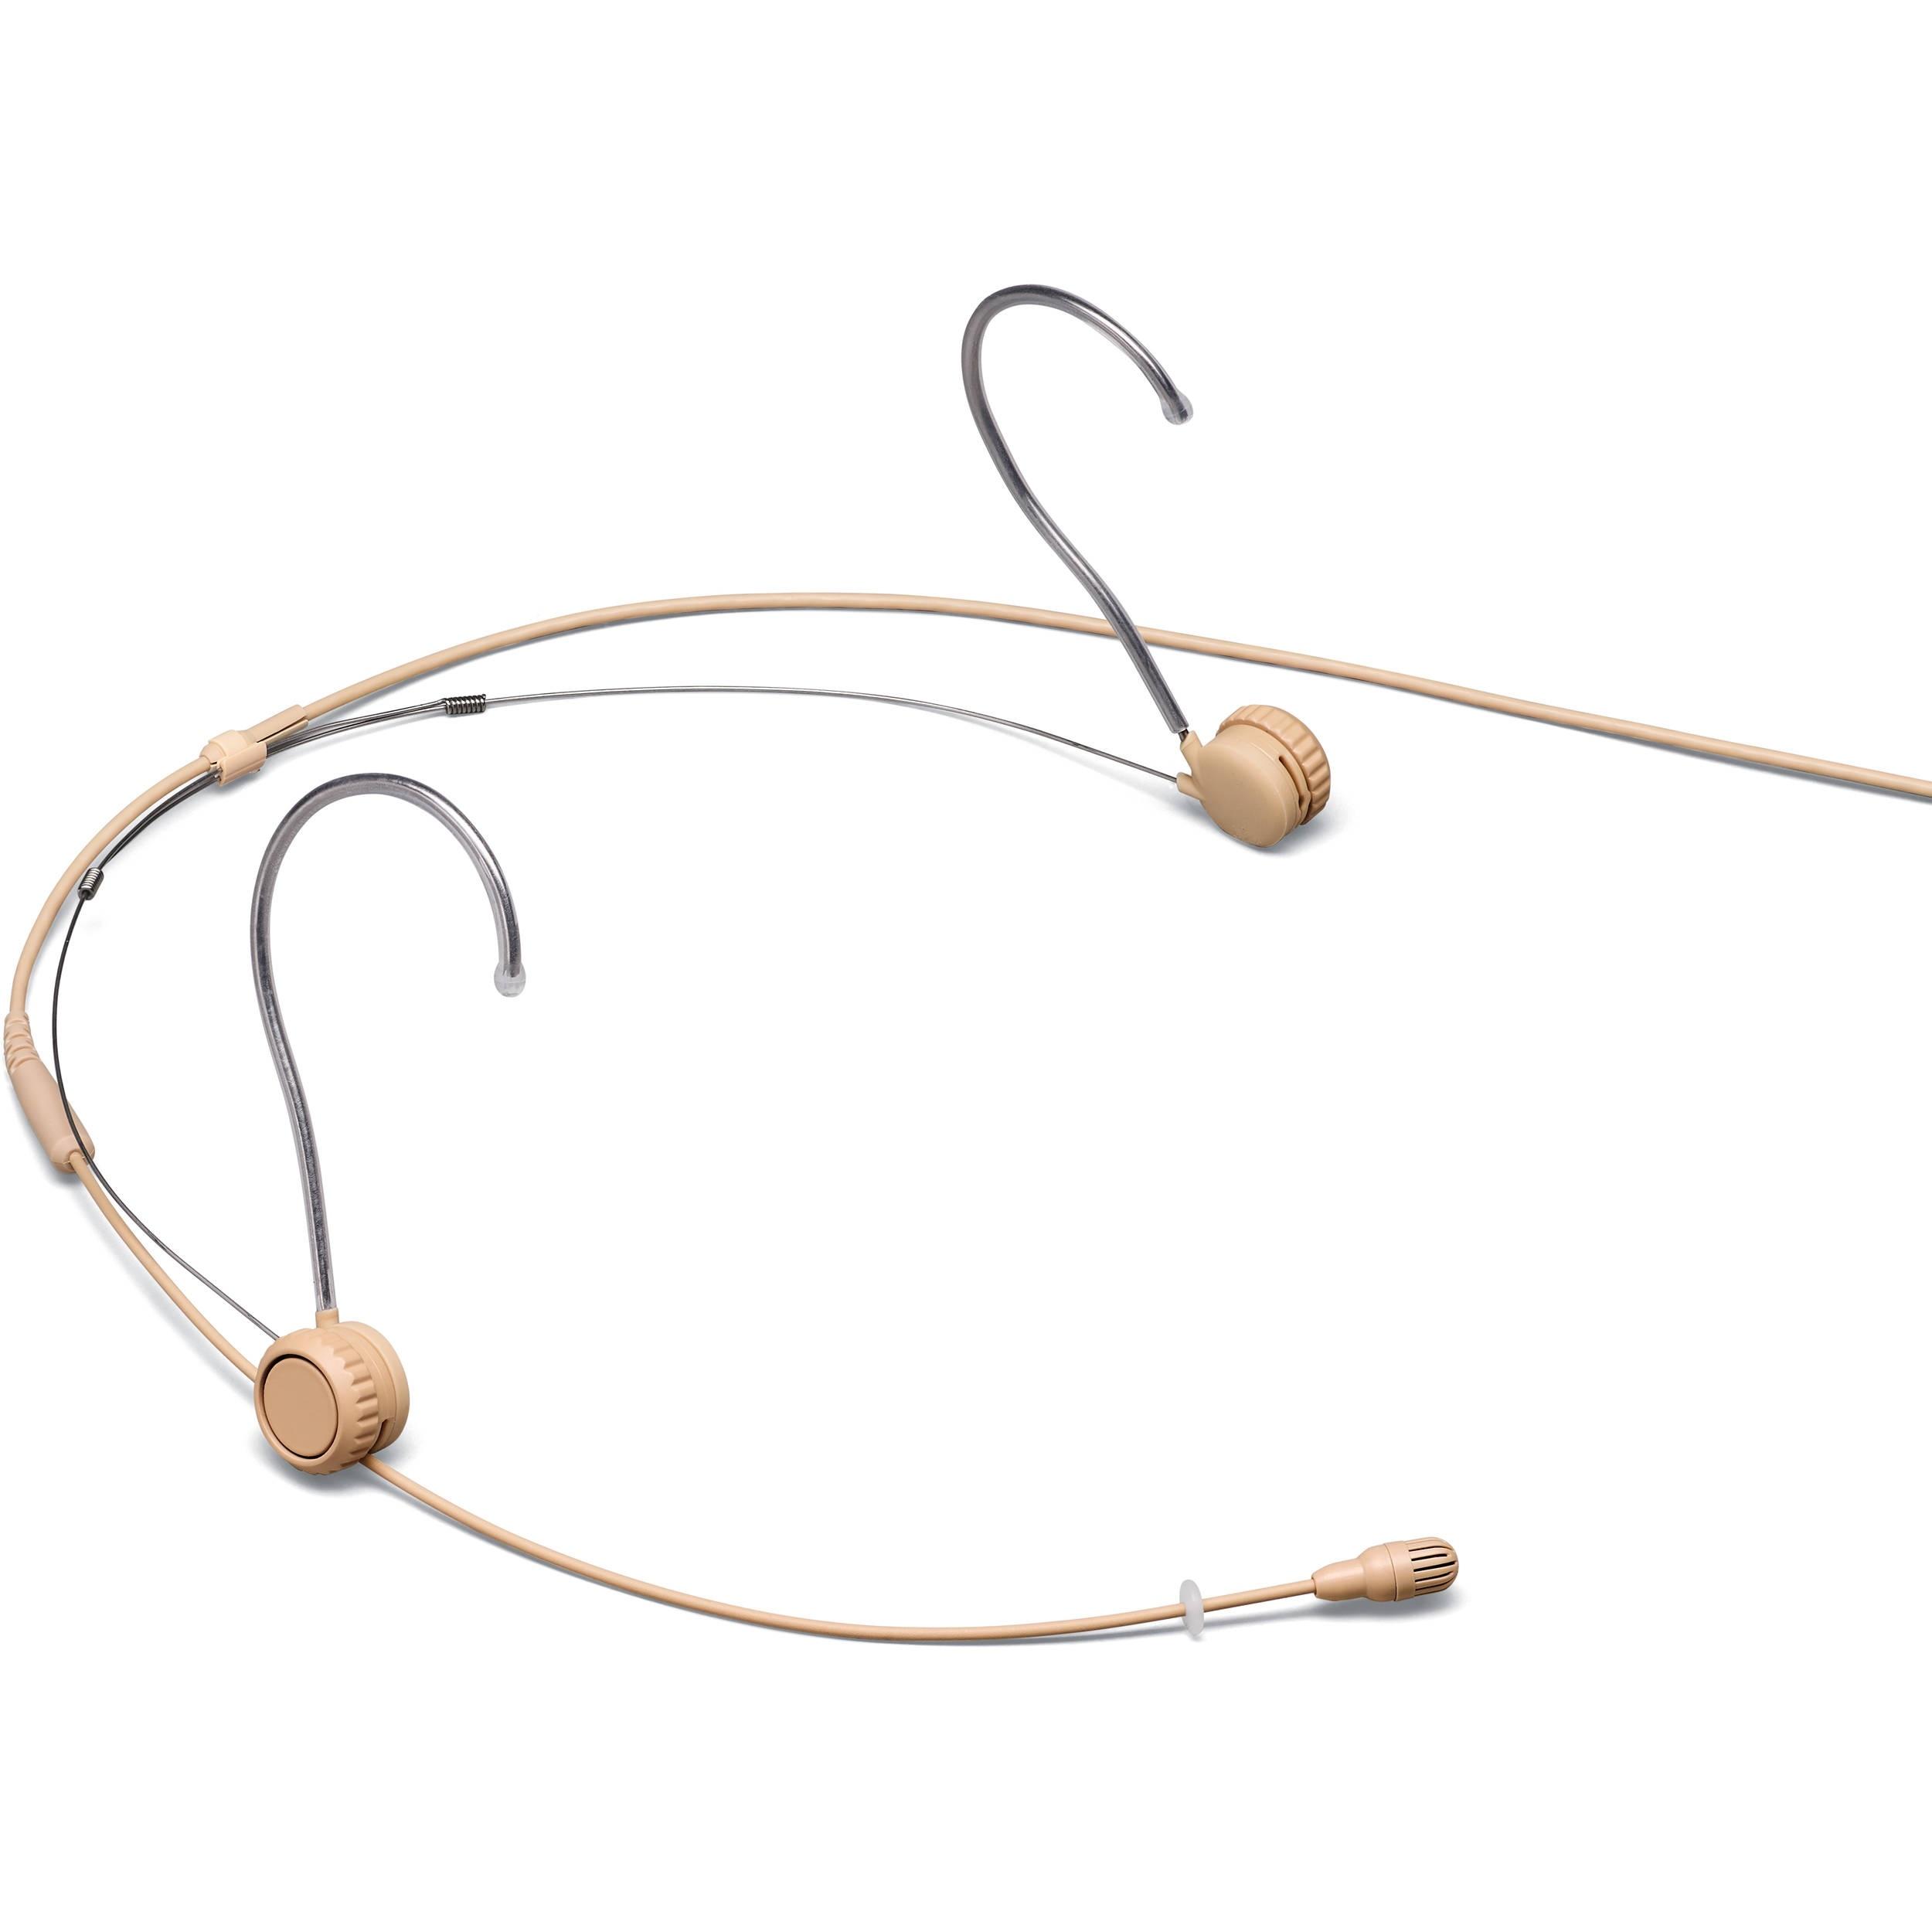 Shure TwinPlex TH53 Omnidirectional Headset Microphone (TA4F, Tan)